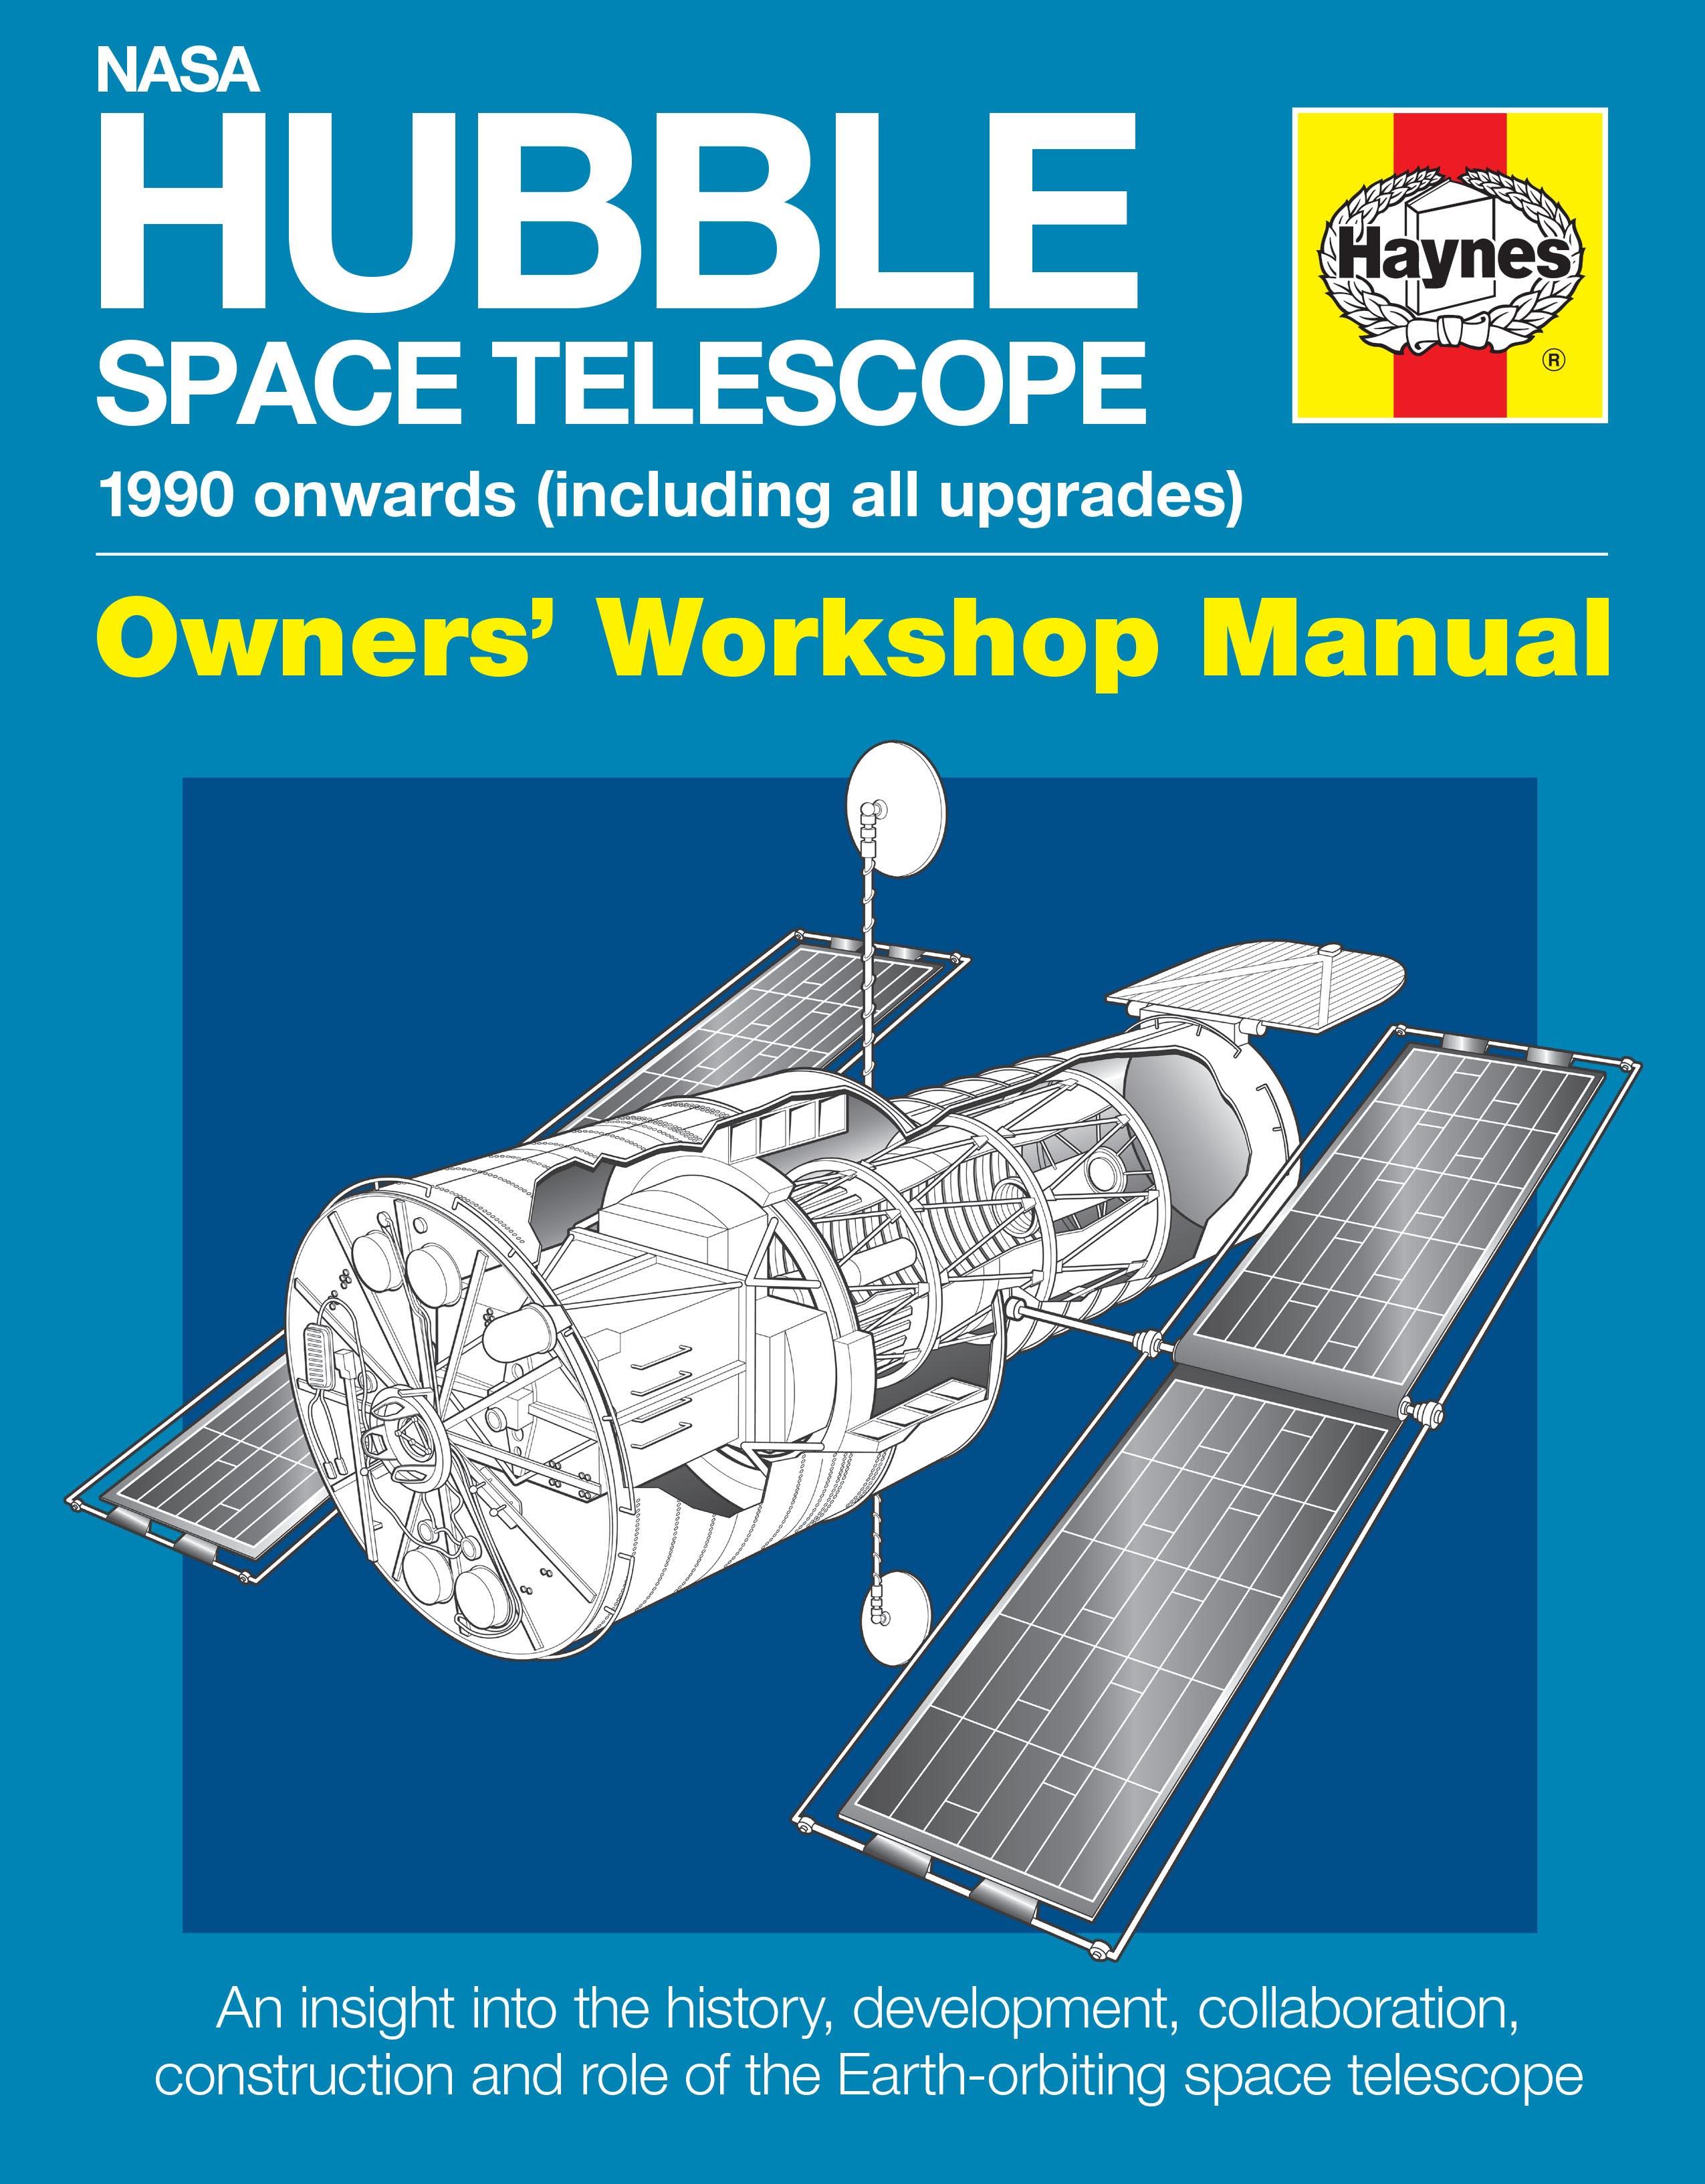 Nasa Hubble Space Telescope Owners' Workshop Manual